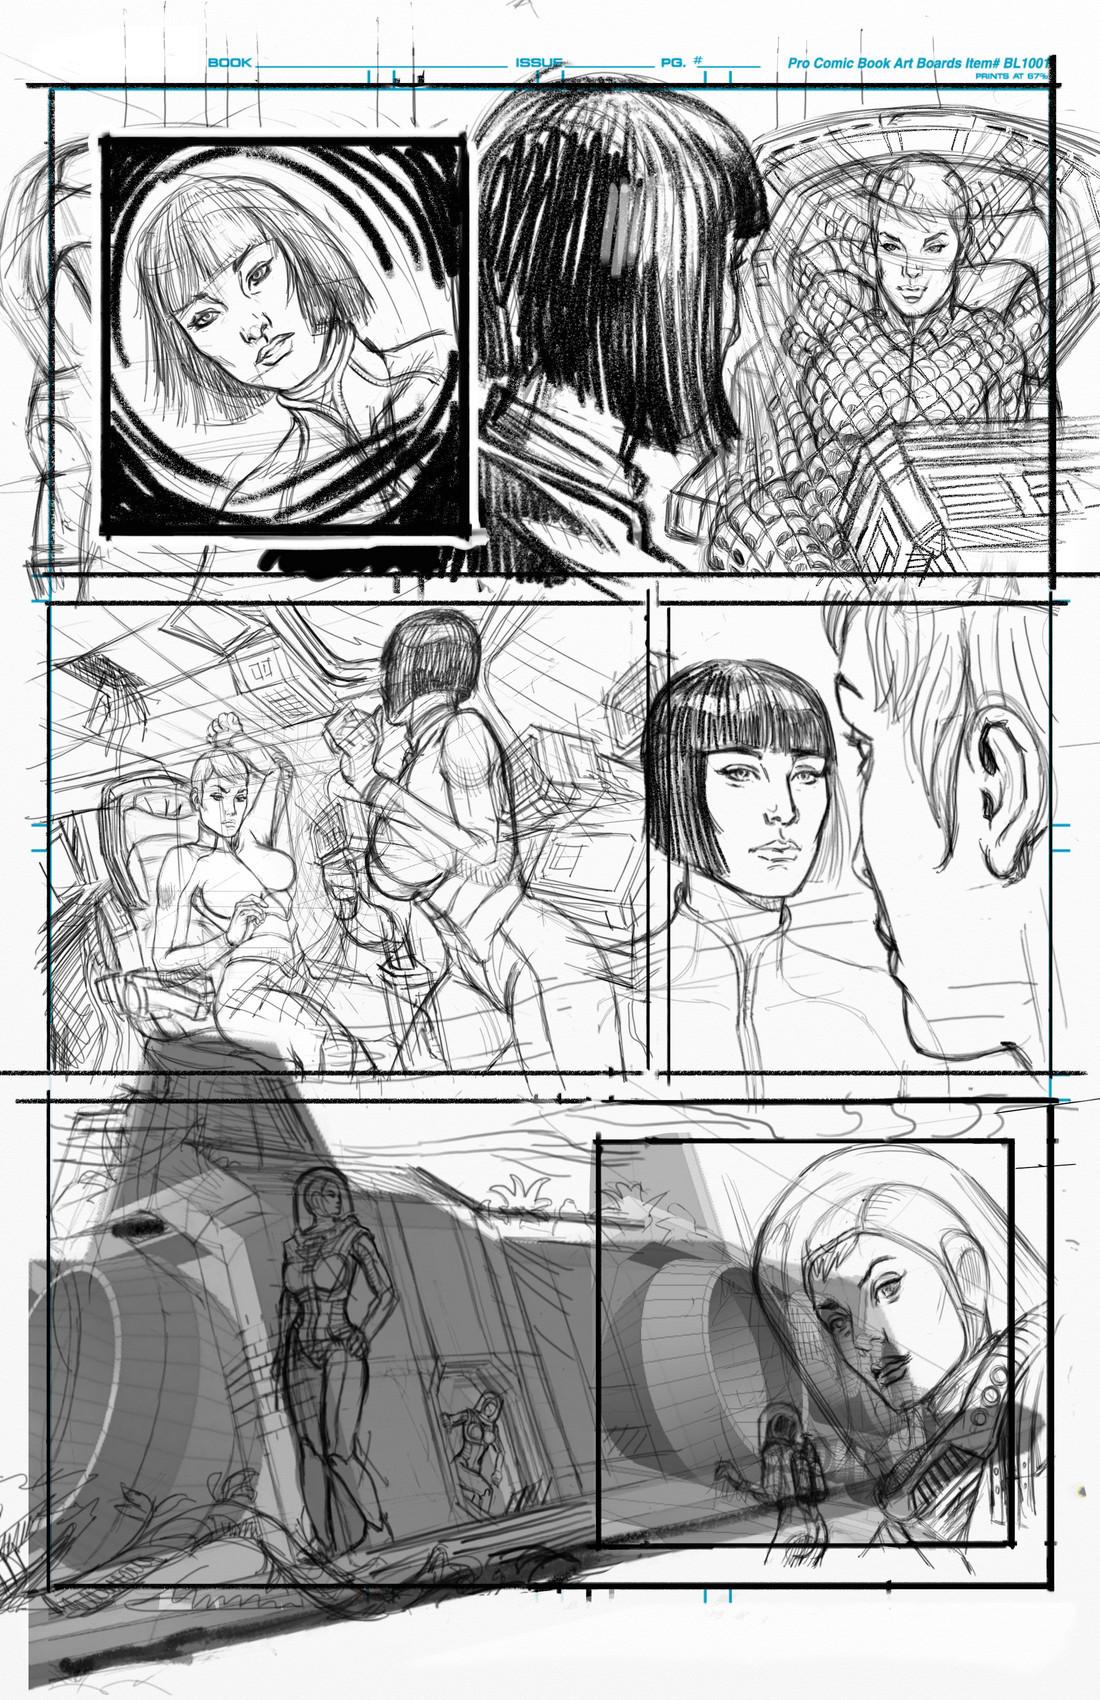 Zoltan korcsok page2penciling19